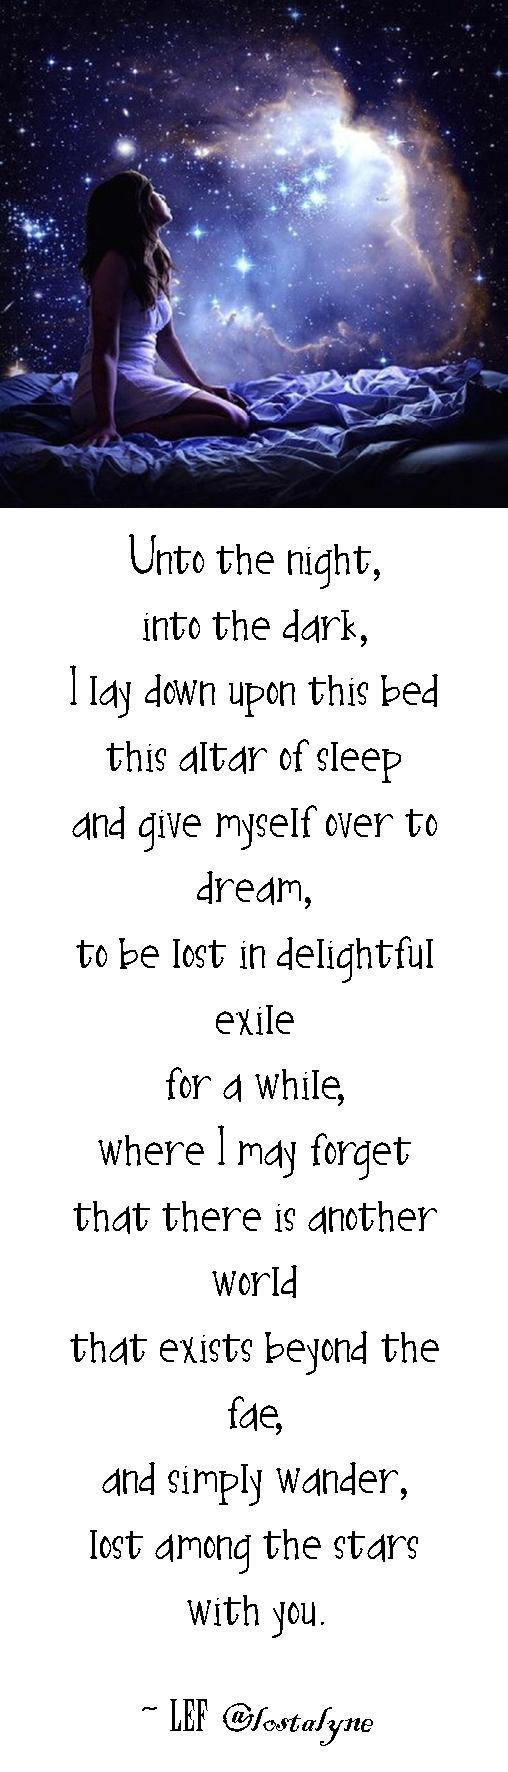 delightful-exile